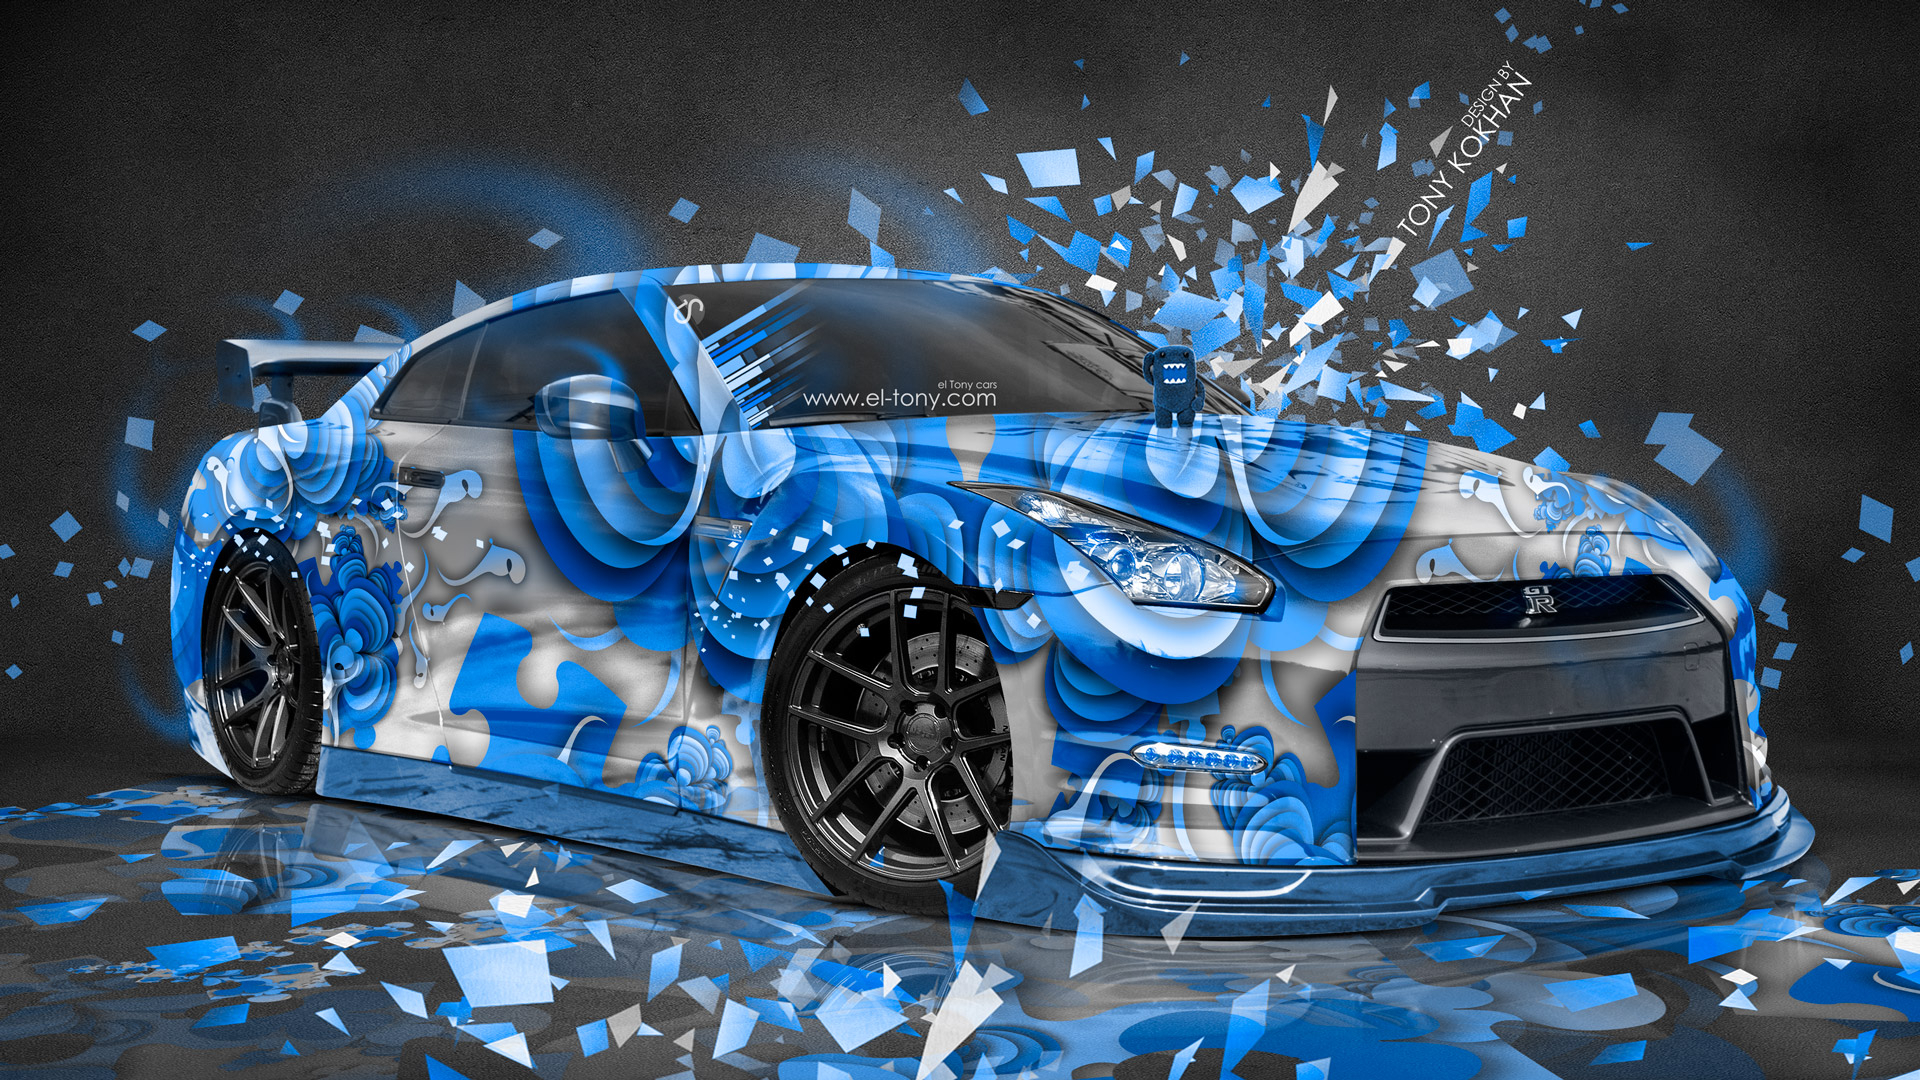 Jdm Cars Live Wallpaper